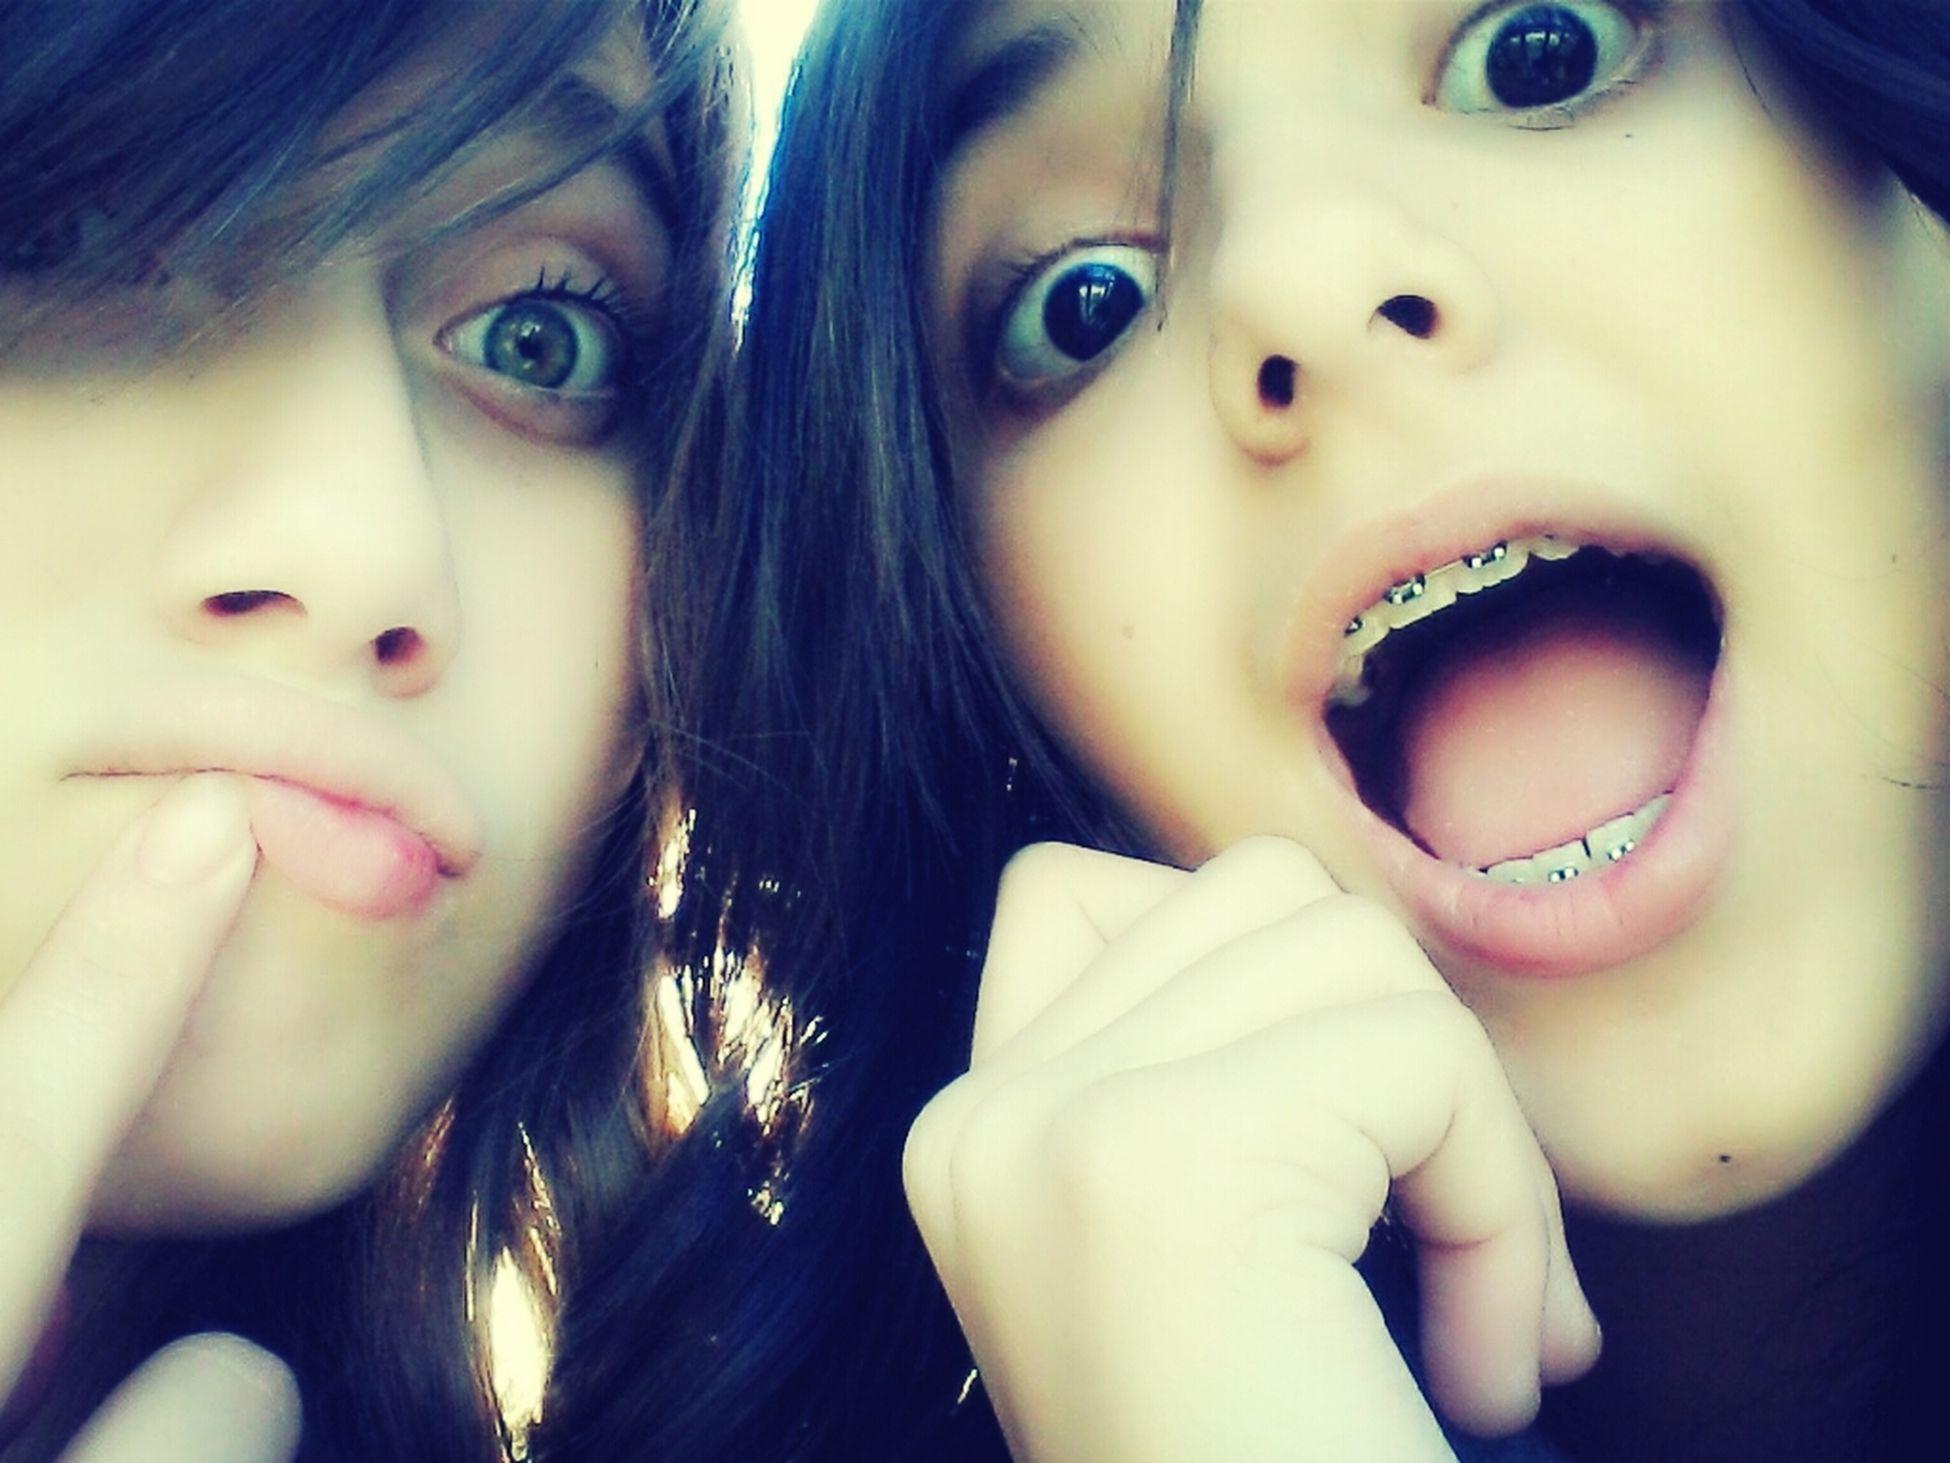 Guhhhh i LOVE you ♡